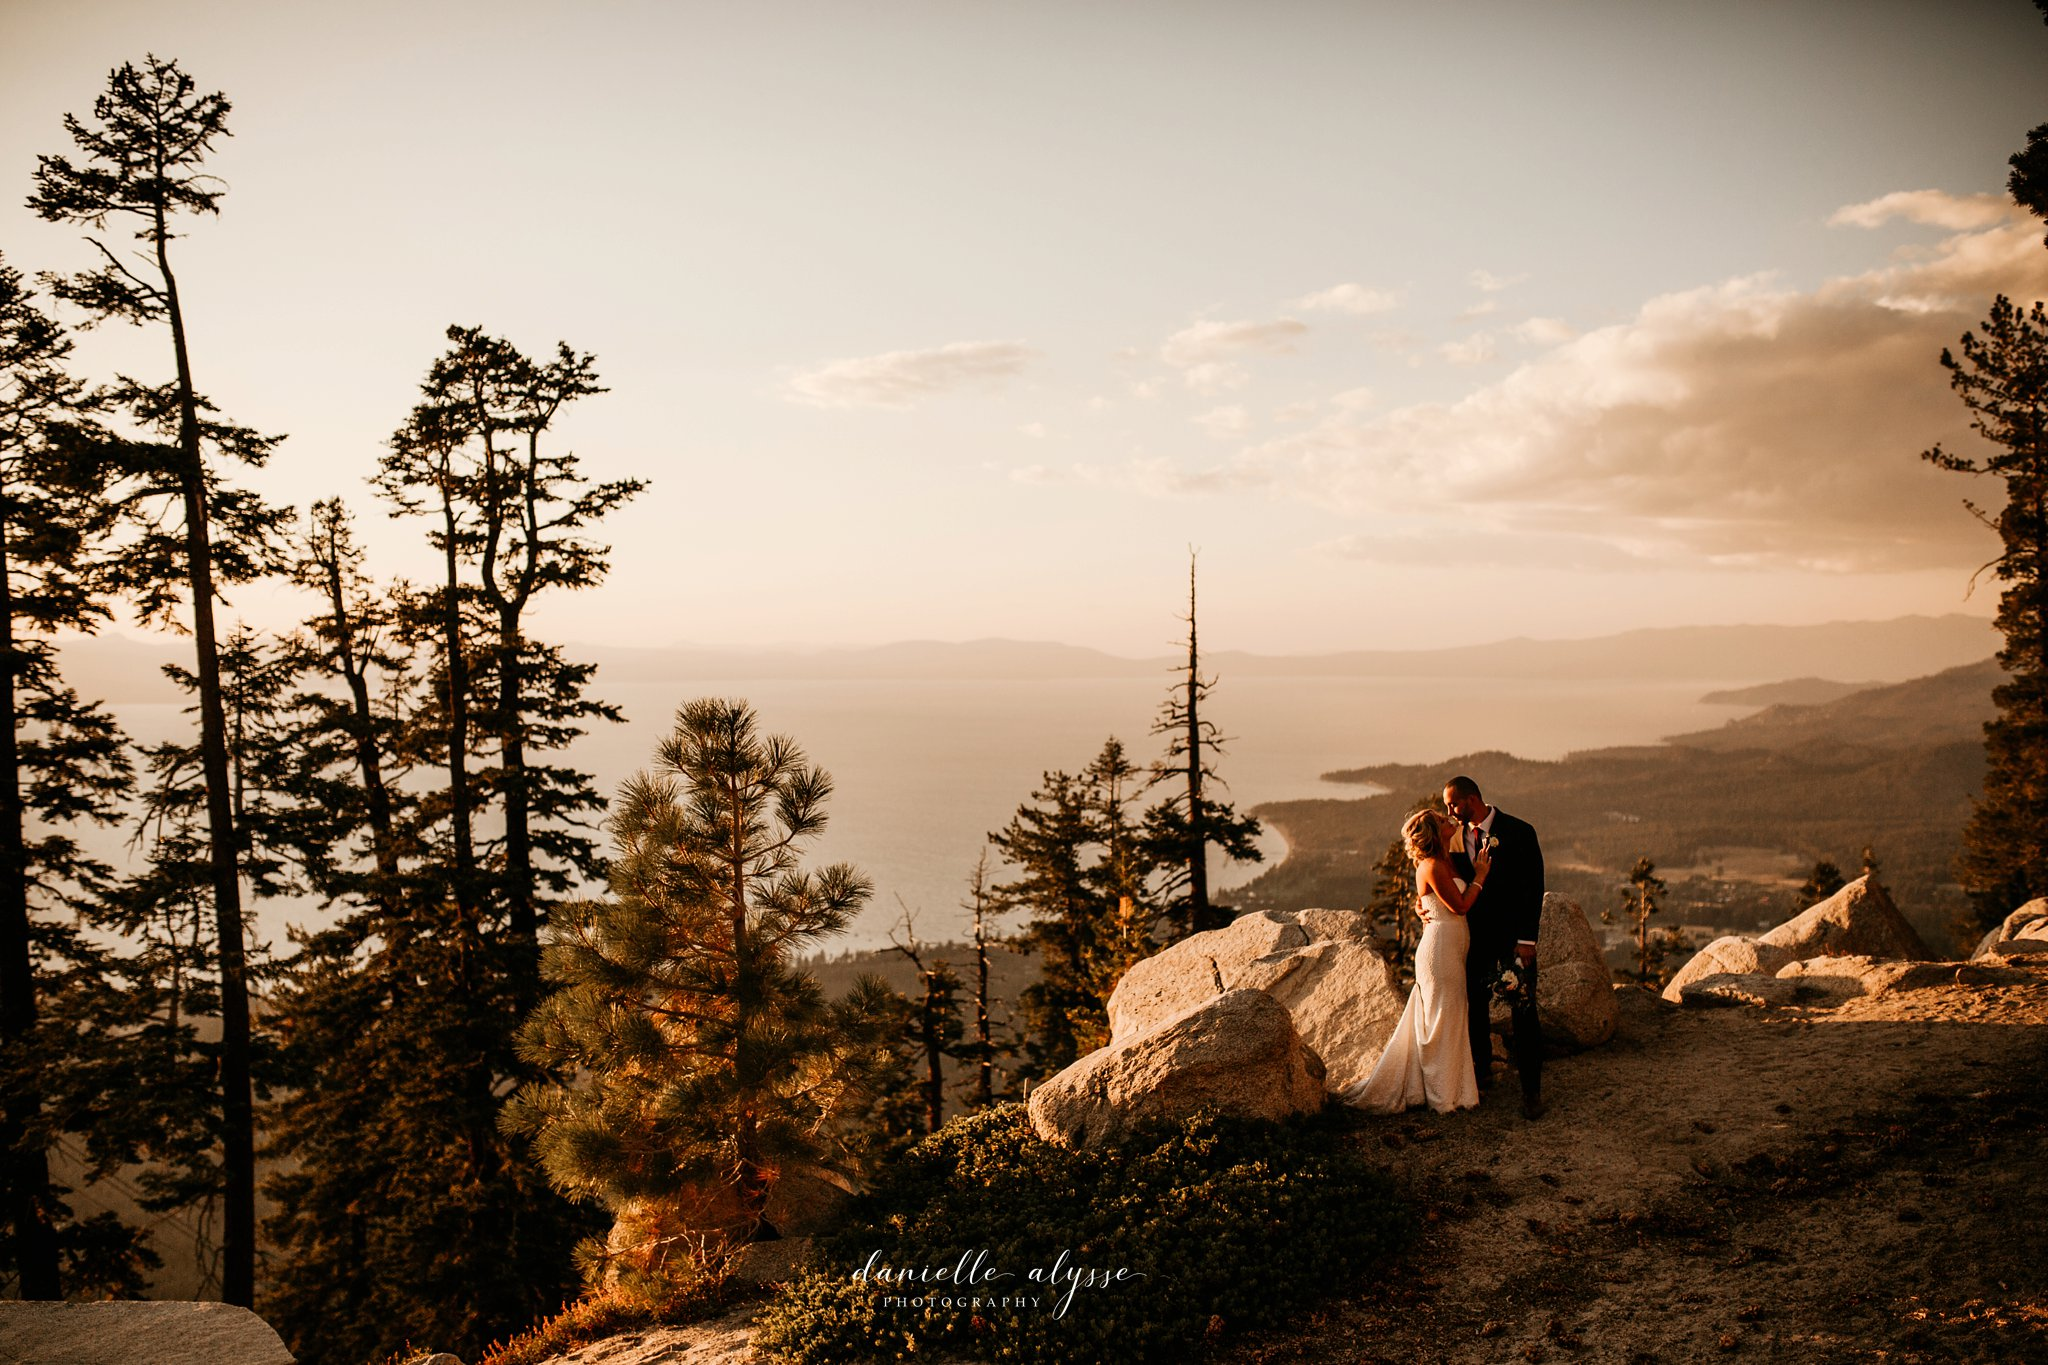 180831_wedding_stephanie_heavenly_south_lake_tahoe_danielle_alysse_photography_destination_blog_1011_WEB.jpg